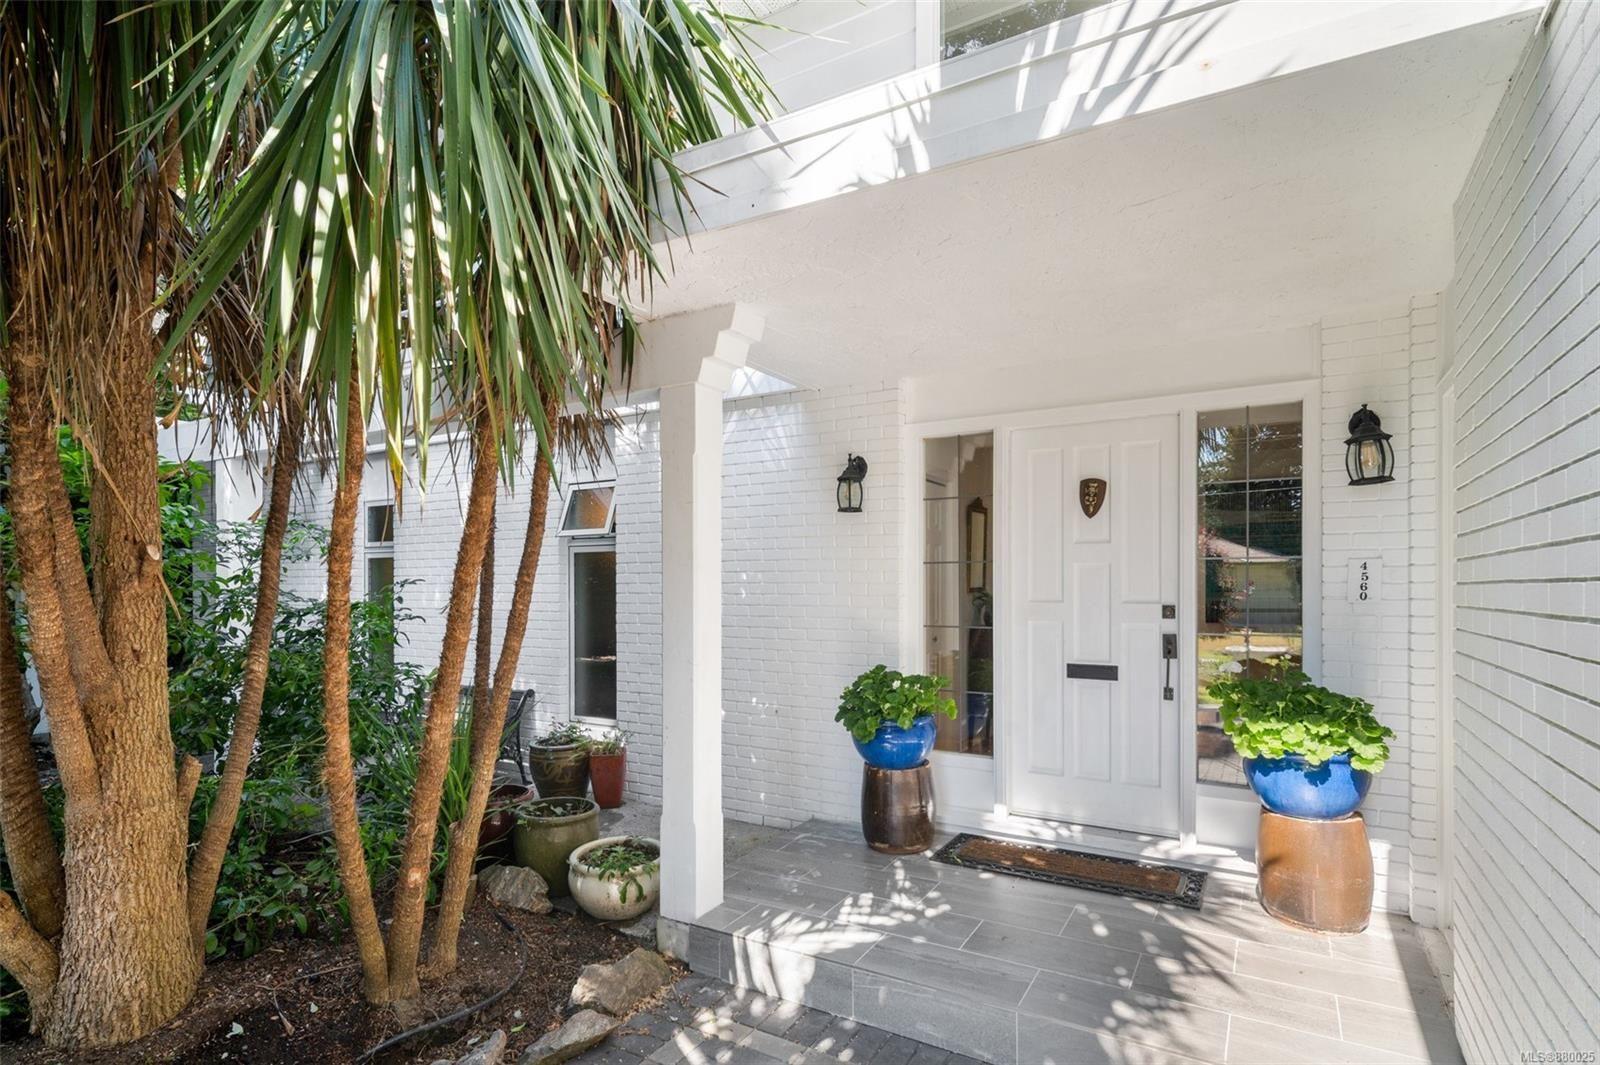 Main Photo: 4560 Balmacarra Rd in : SE Gordon Head House for sale (Saanich East)  : MLS®# 880025